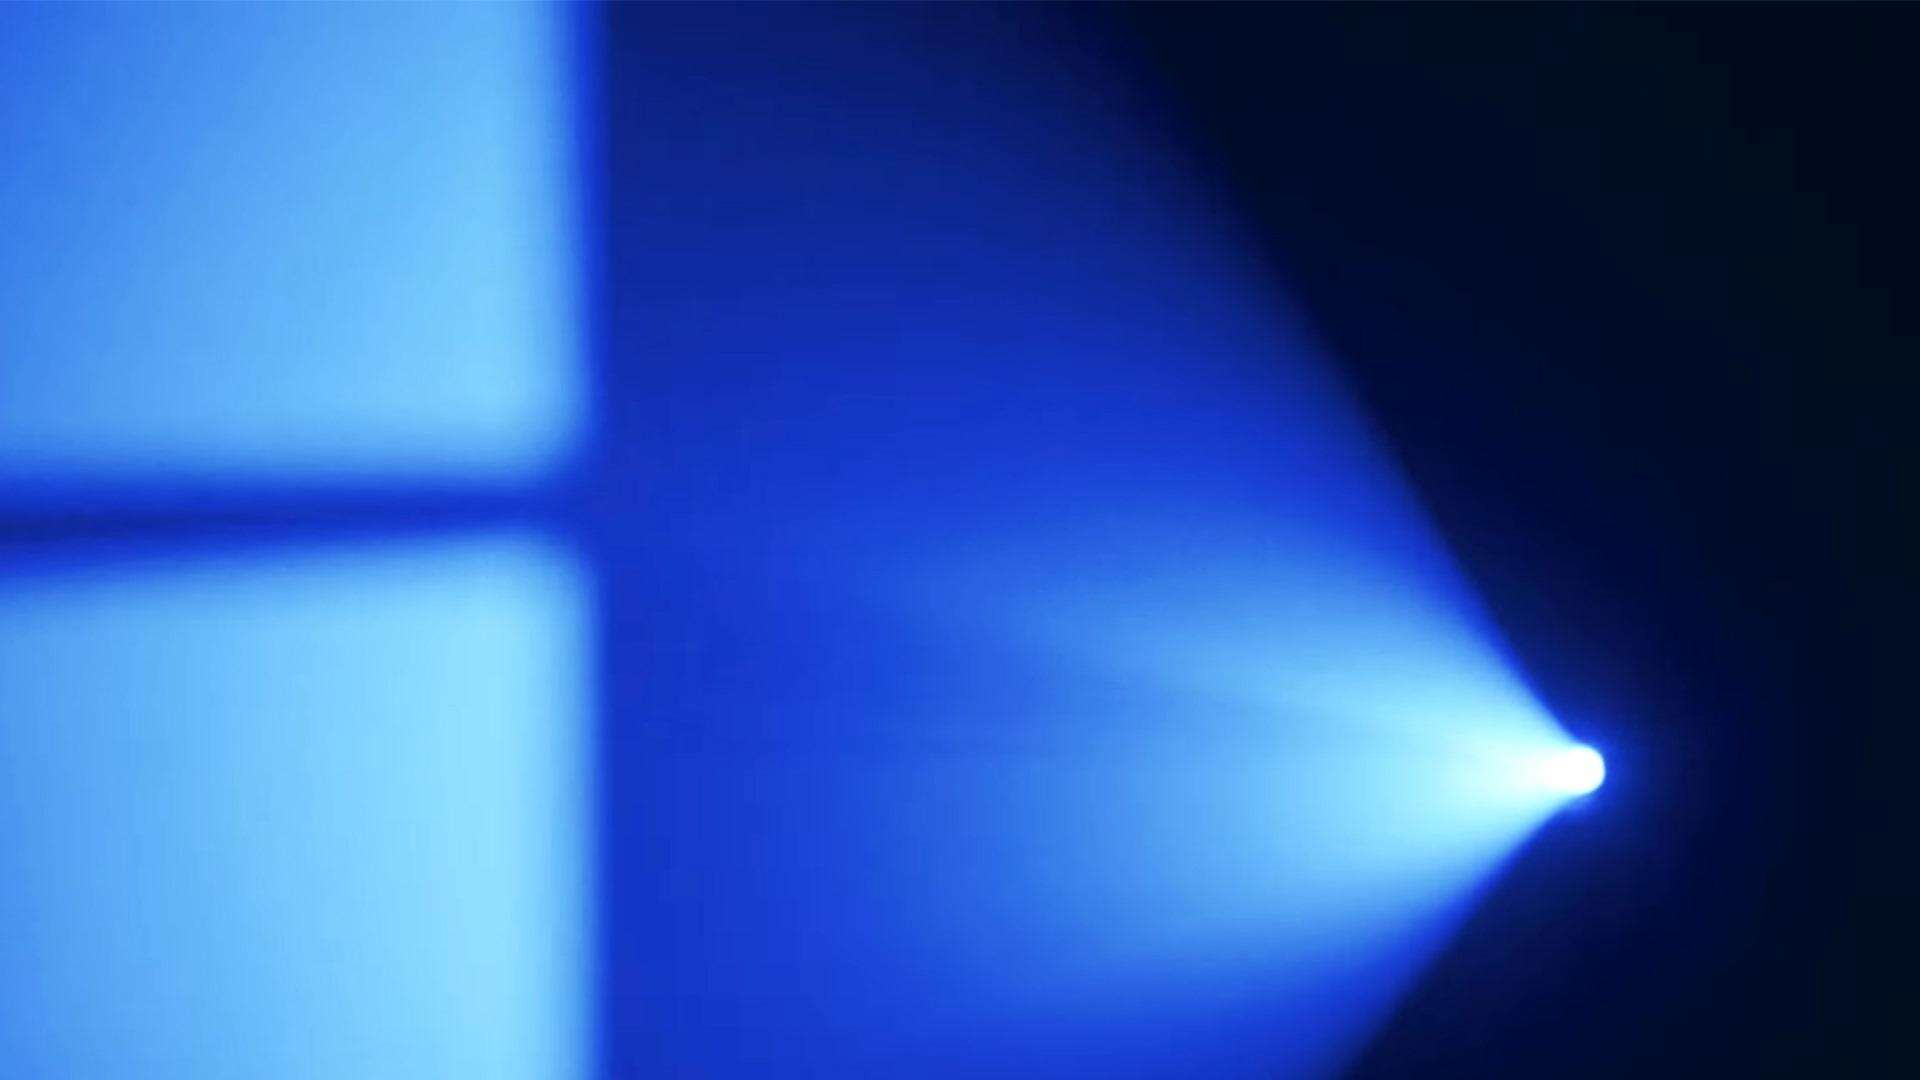 Windows 10 HD desktop wallpaper collection (2) #13